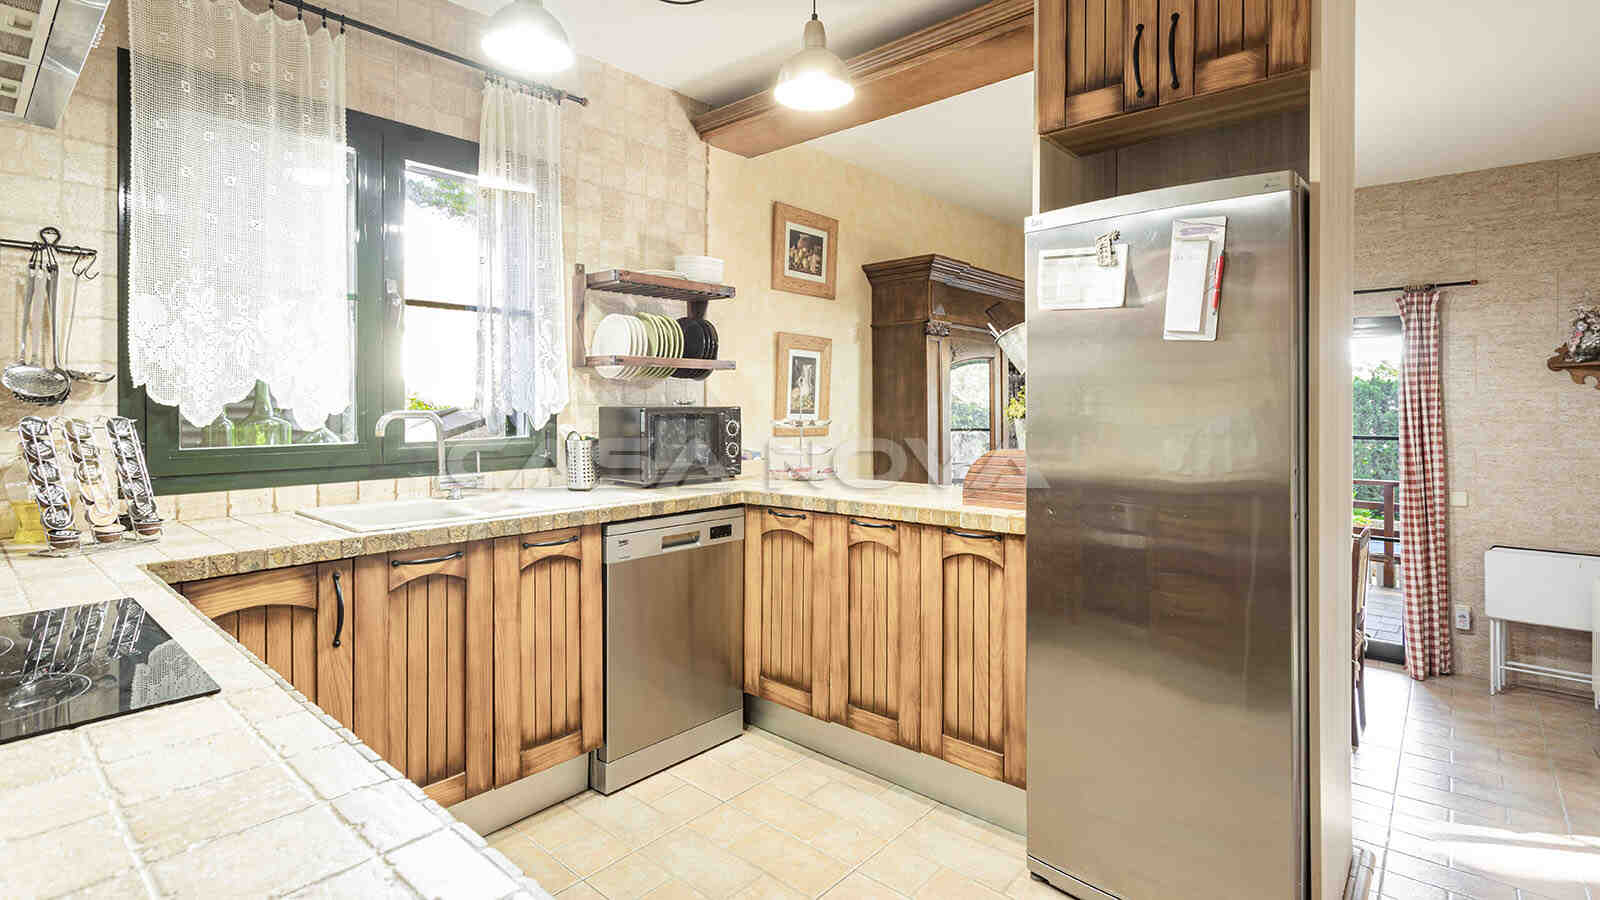 Offene Einbauküche mit Elektrogeräten